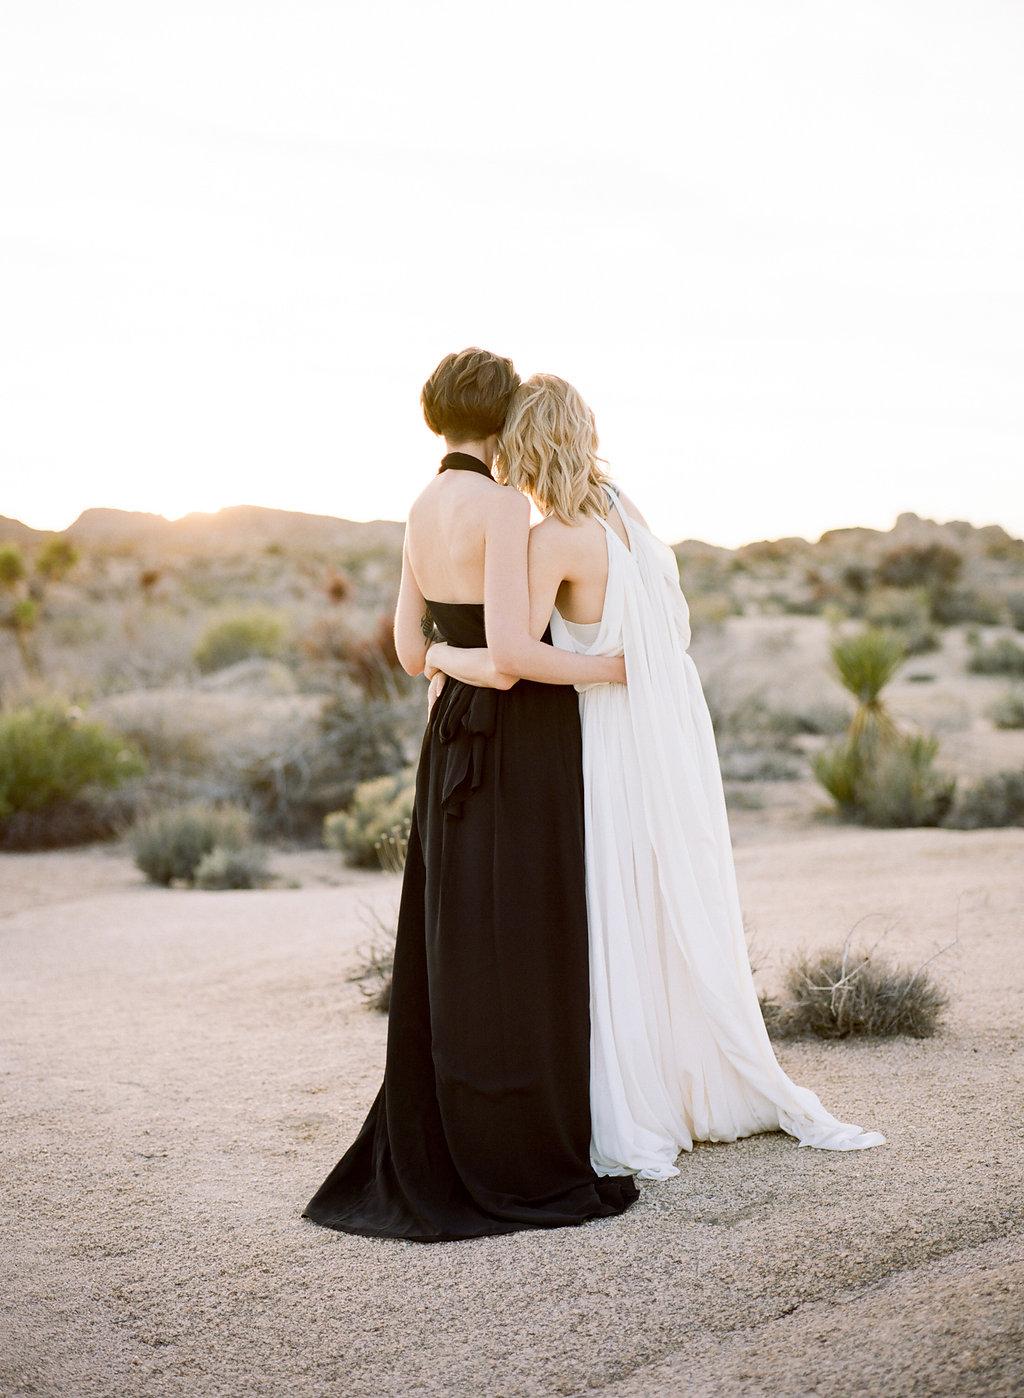 Jessica Schilling Wedding Photography couple admiring desert shot from behind